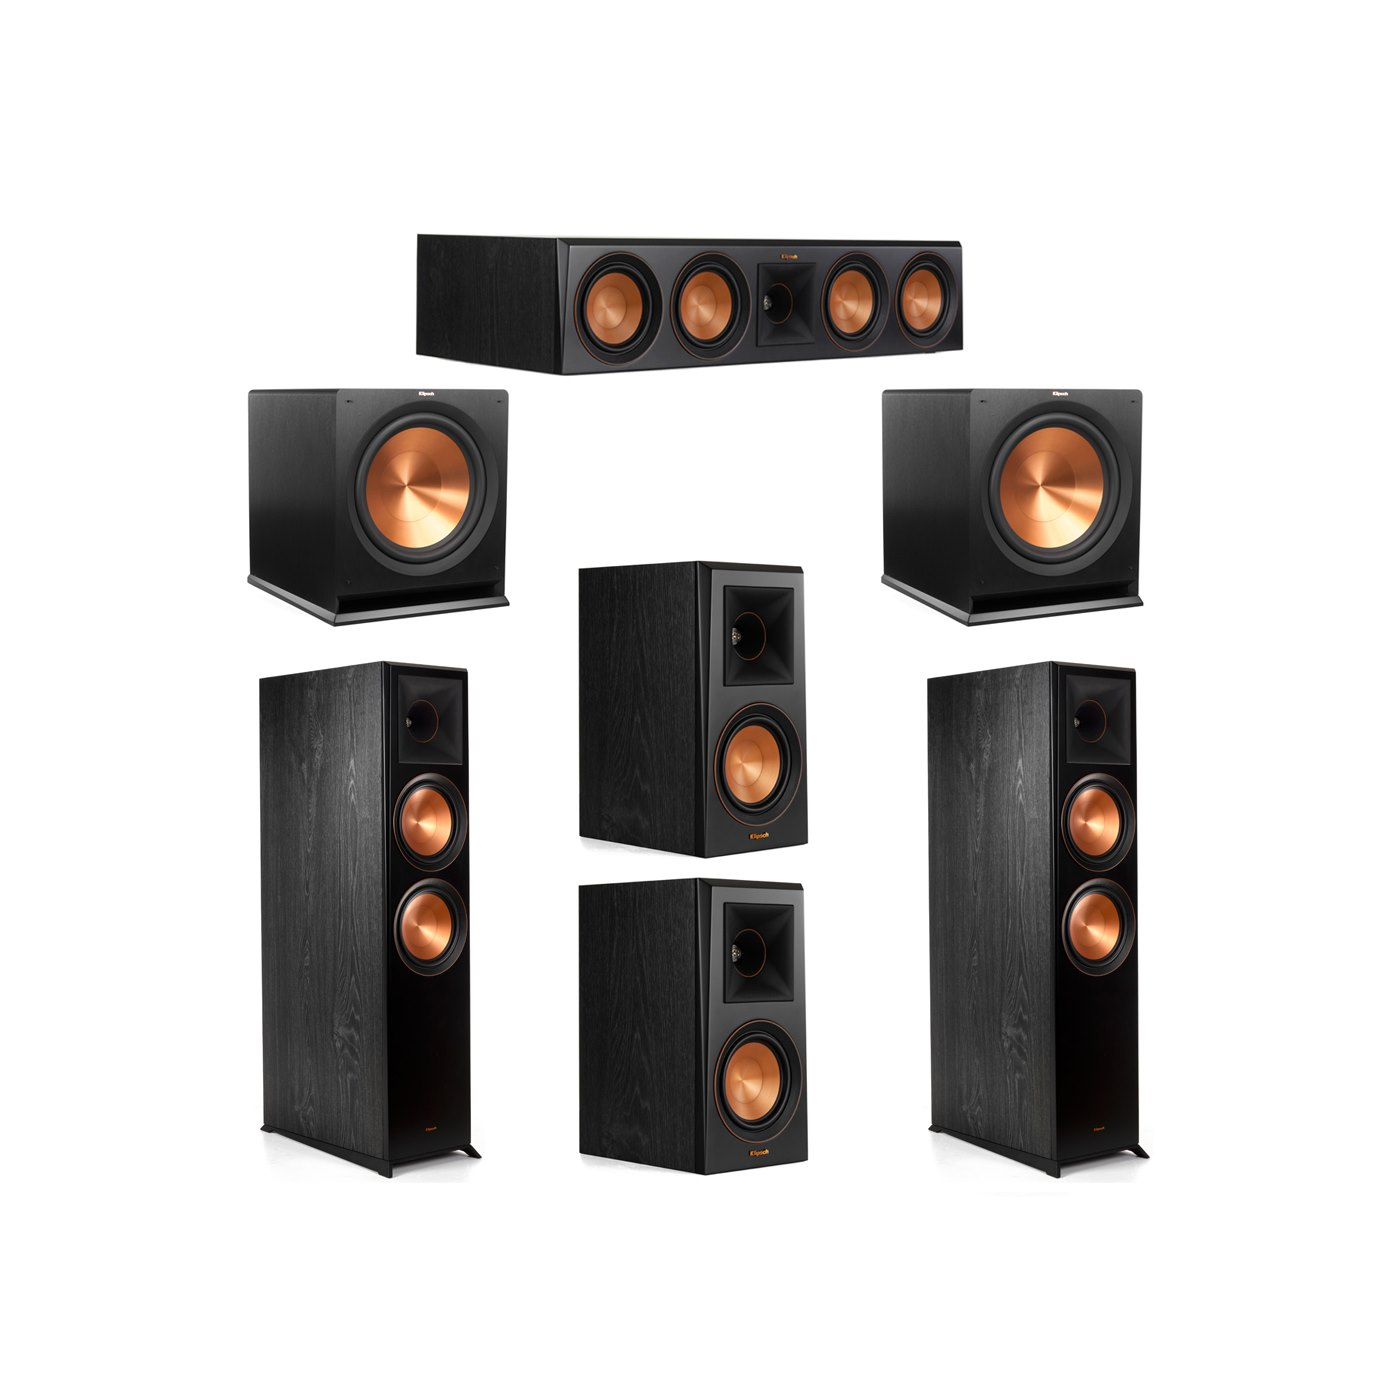 Klipsch 5.2 System with 2 RP-8000F Floorstanding Speakers, 1 Klipsch RP-504C Center Speaker, 2 Klipsch RP-500M Surround Speakers, 2 Klipsch R-115SW Subwoofers